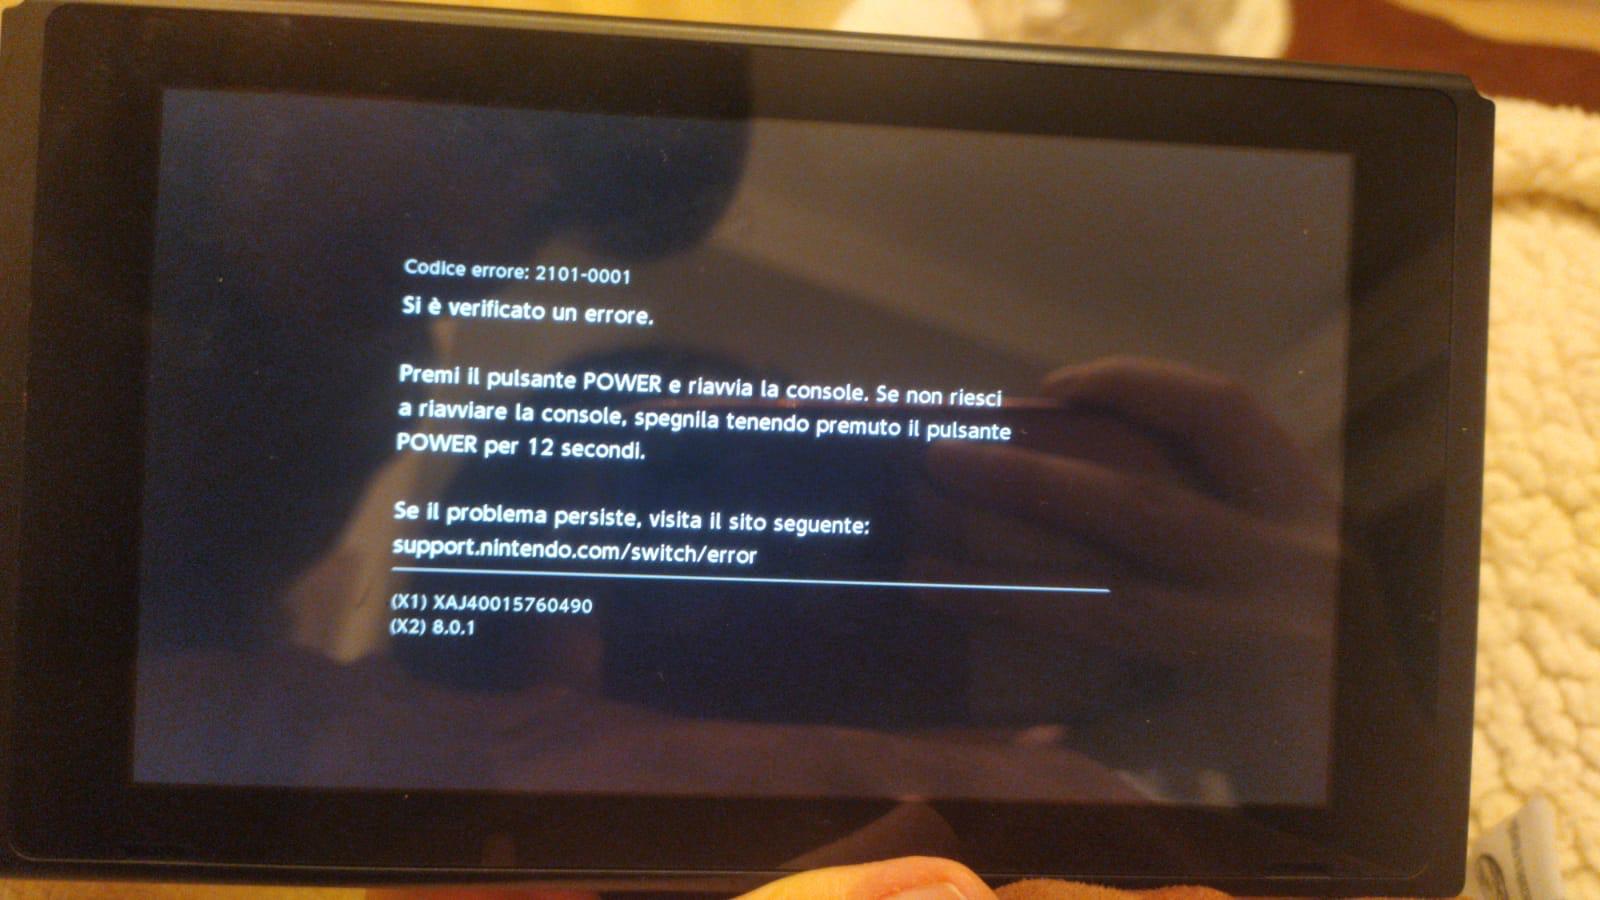 Switch errore 2101-0001